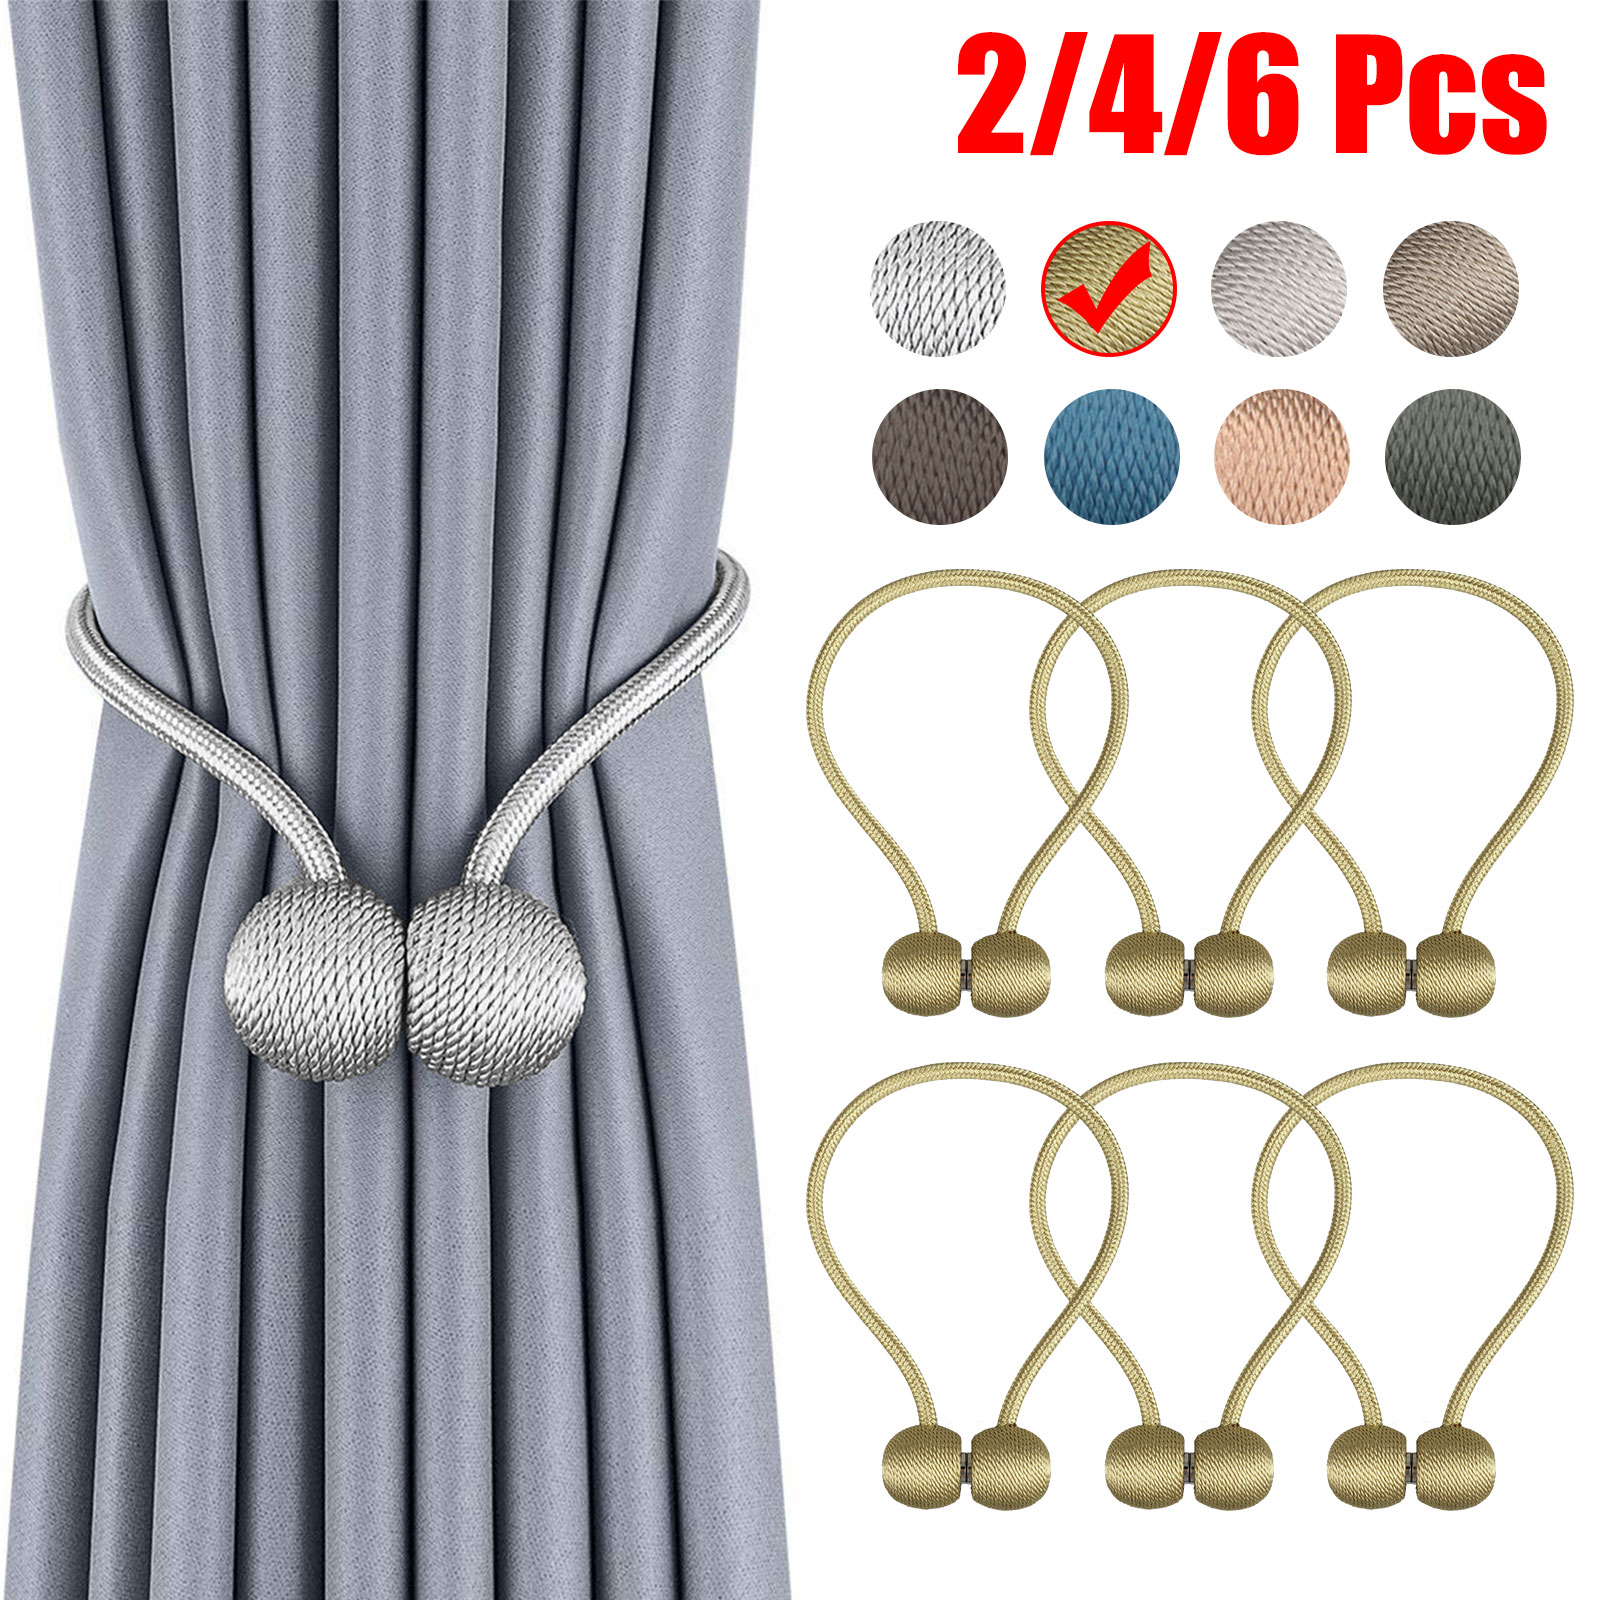 4 PACK Magnetic Curtain Tiebacks Most Convenient Drapery Holdbacks Luxury Decor